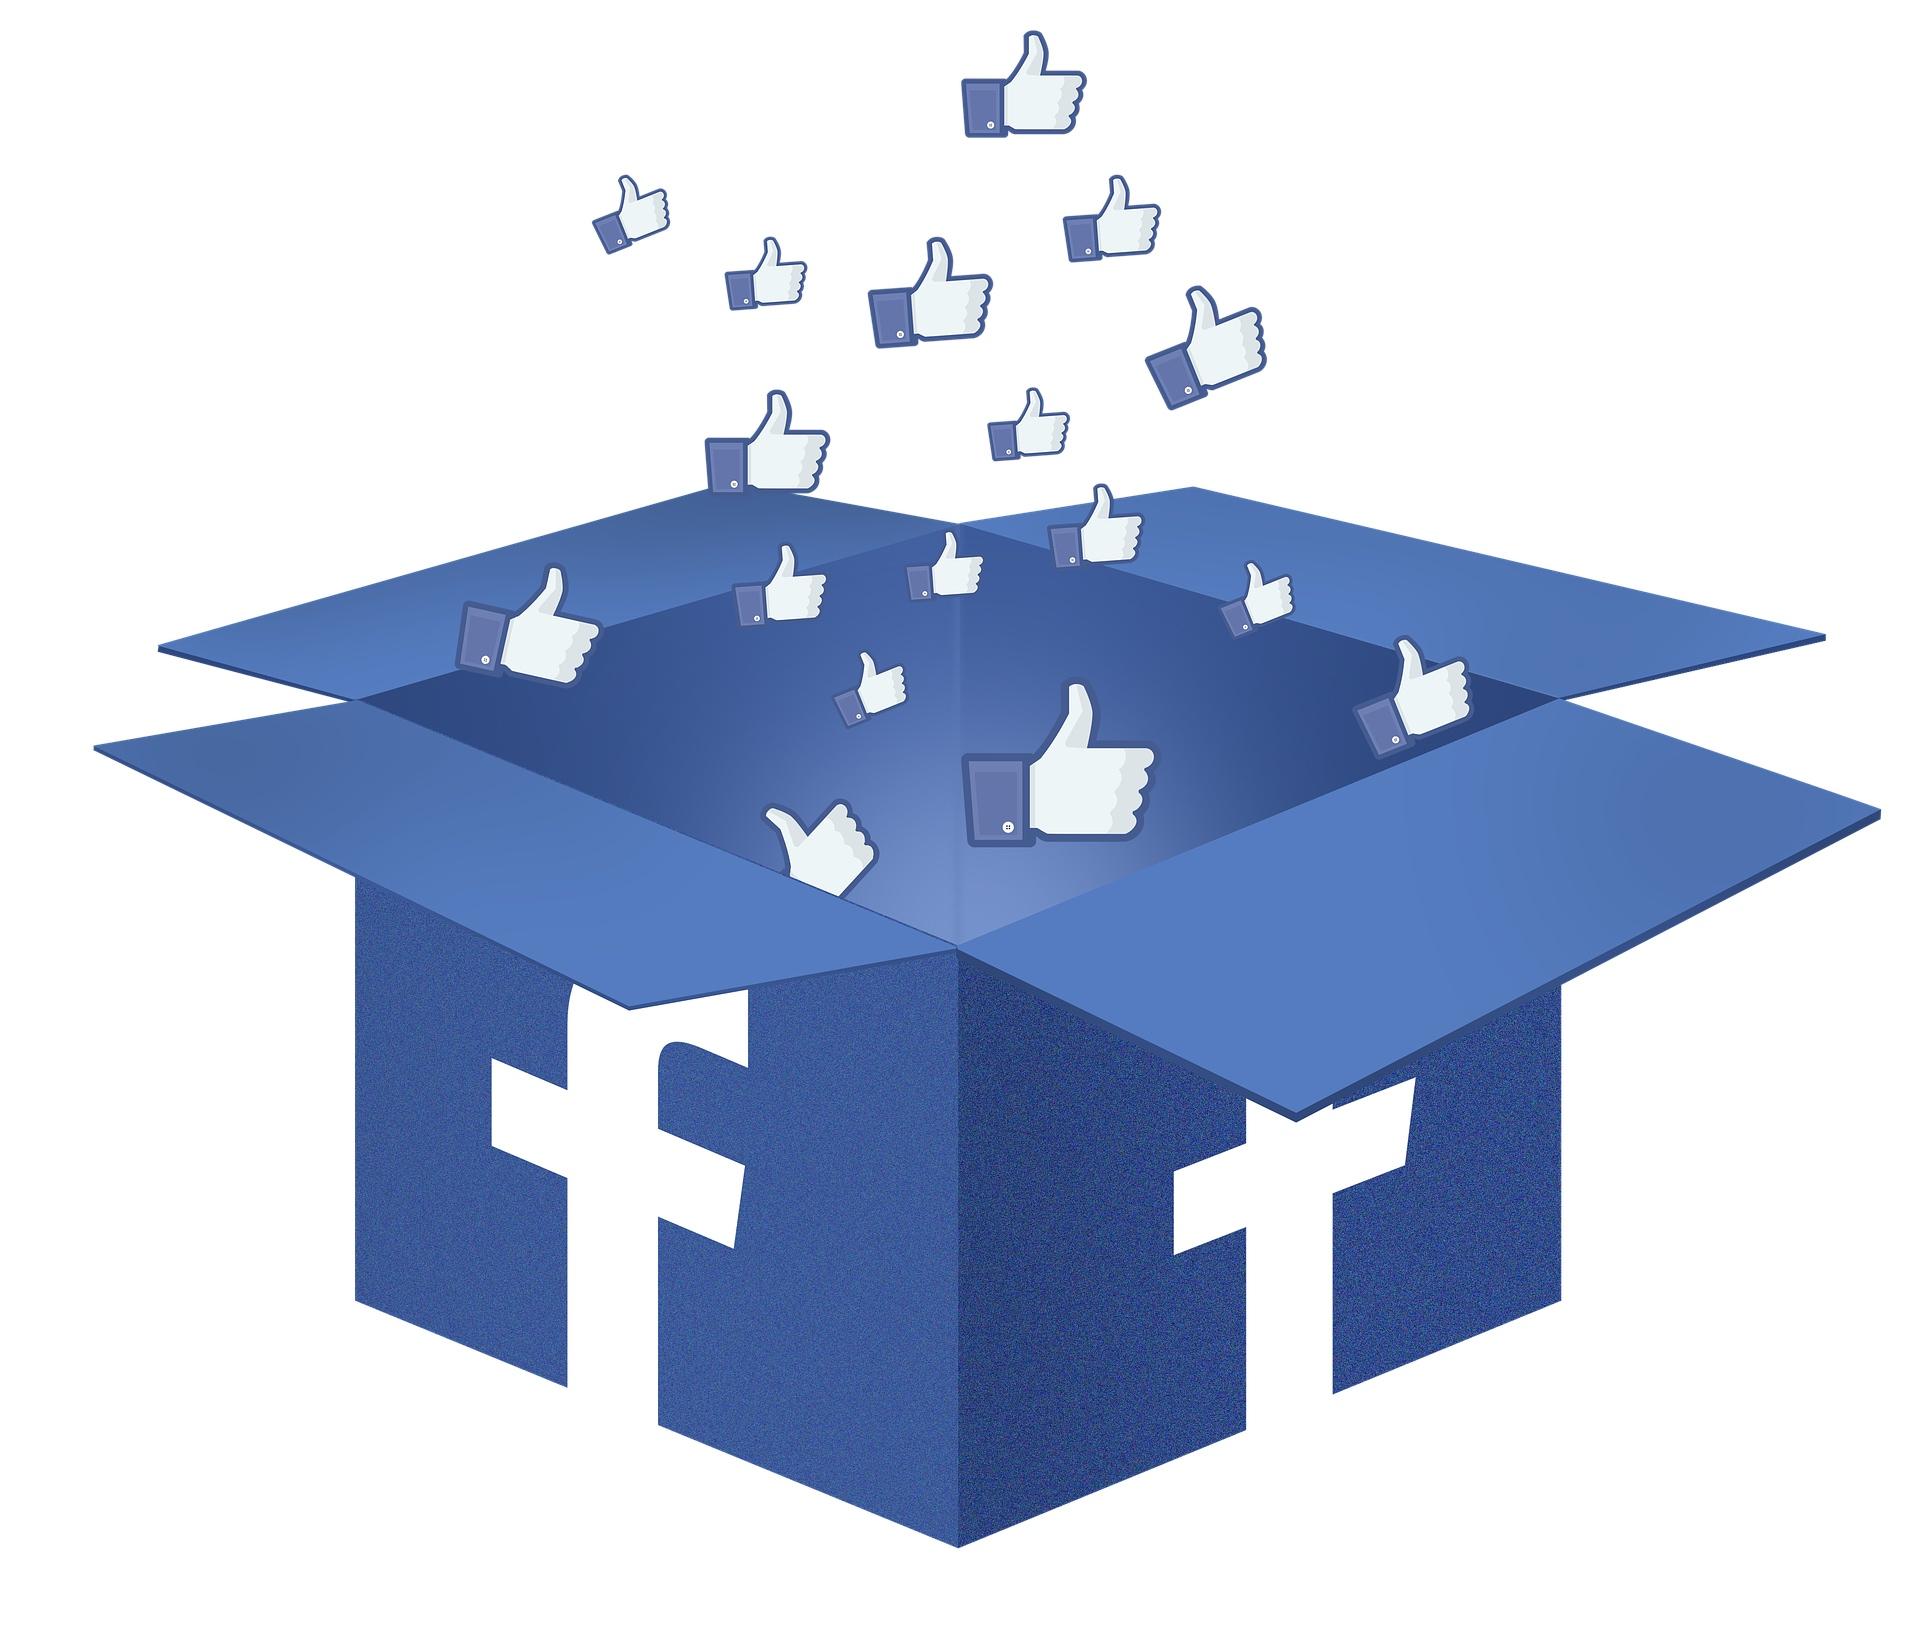 Facebook Box of Likes